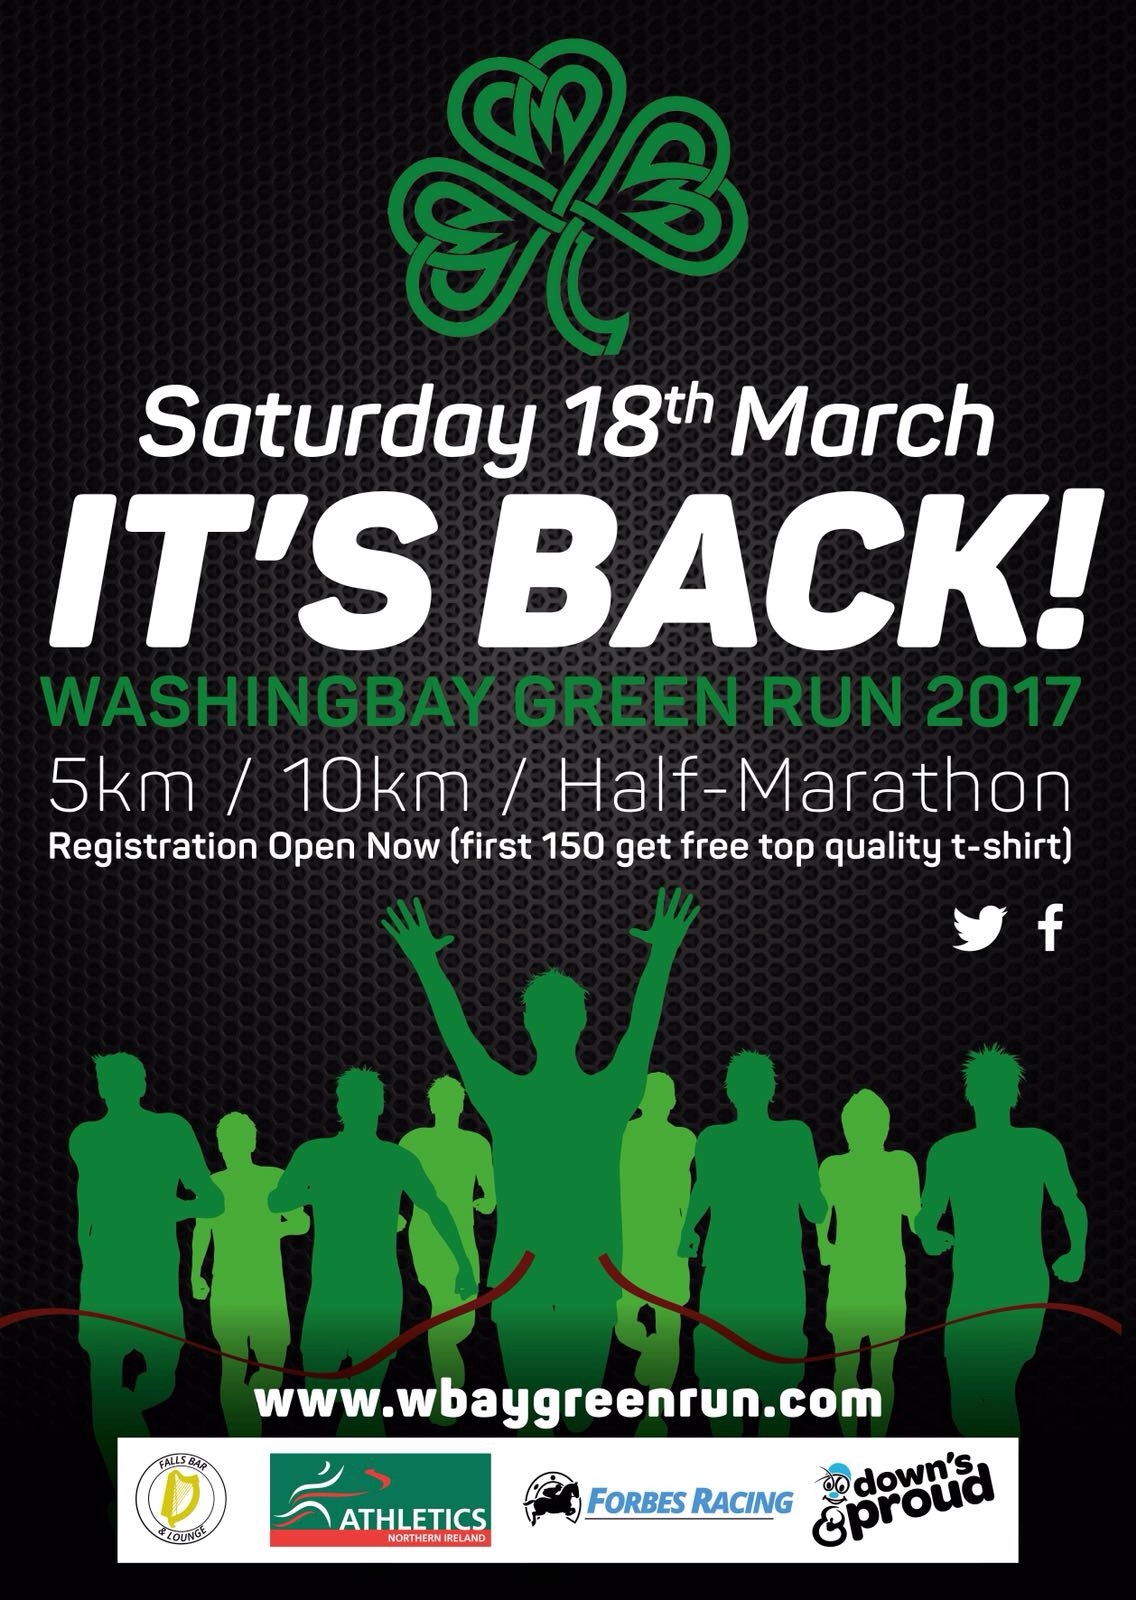 Washingbay Green Run returns on 18th March